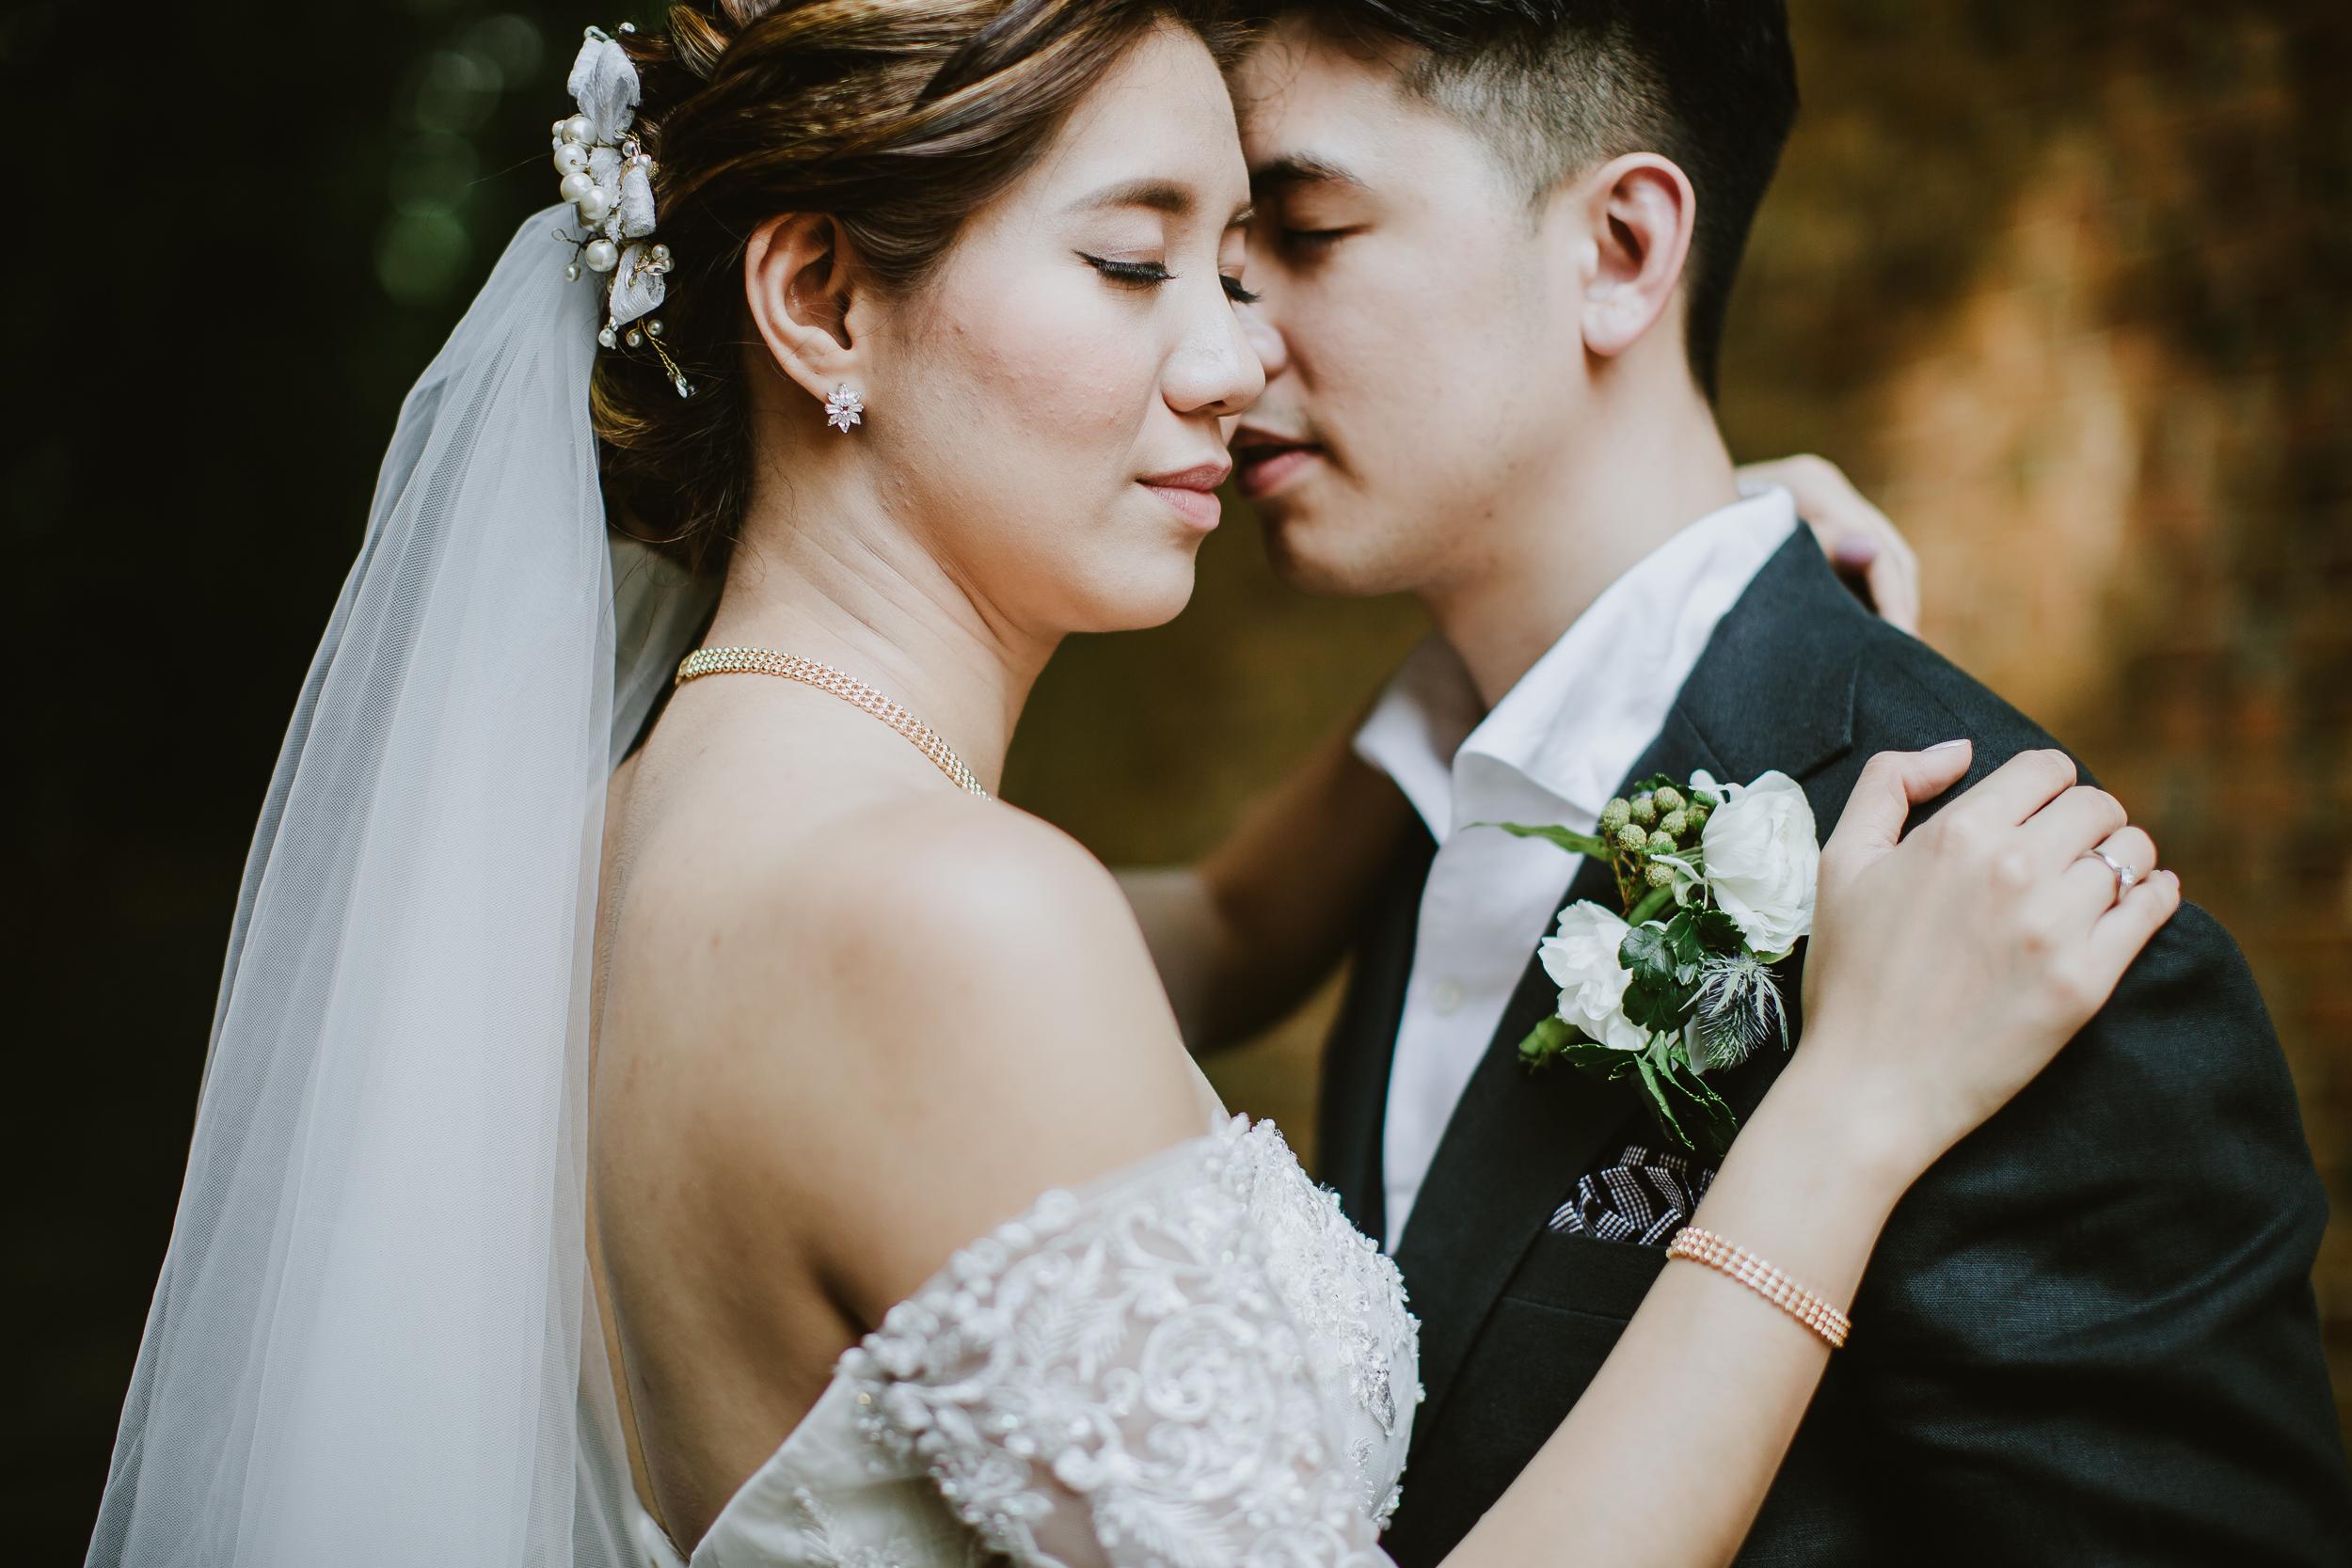 Singapore+Actual+Day+Wedding+Photographer+Raffles+Town+Club+Jeremiah+Christina-0064.jpg